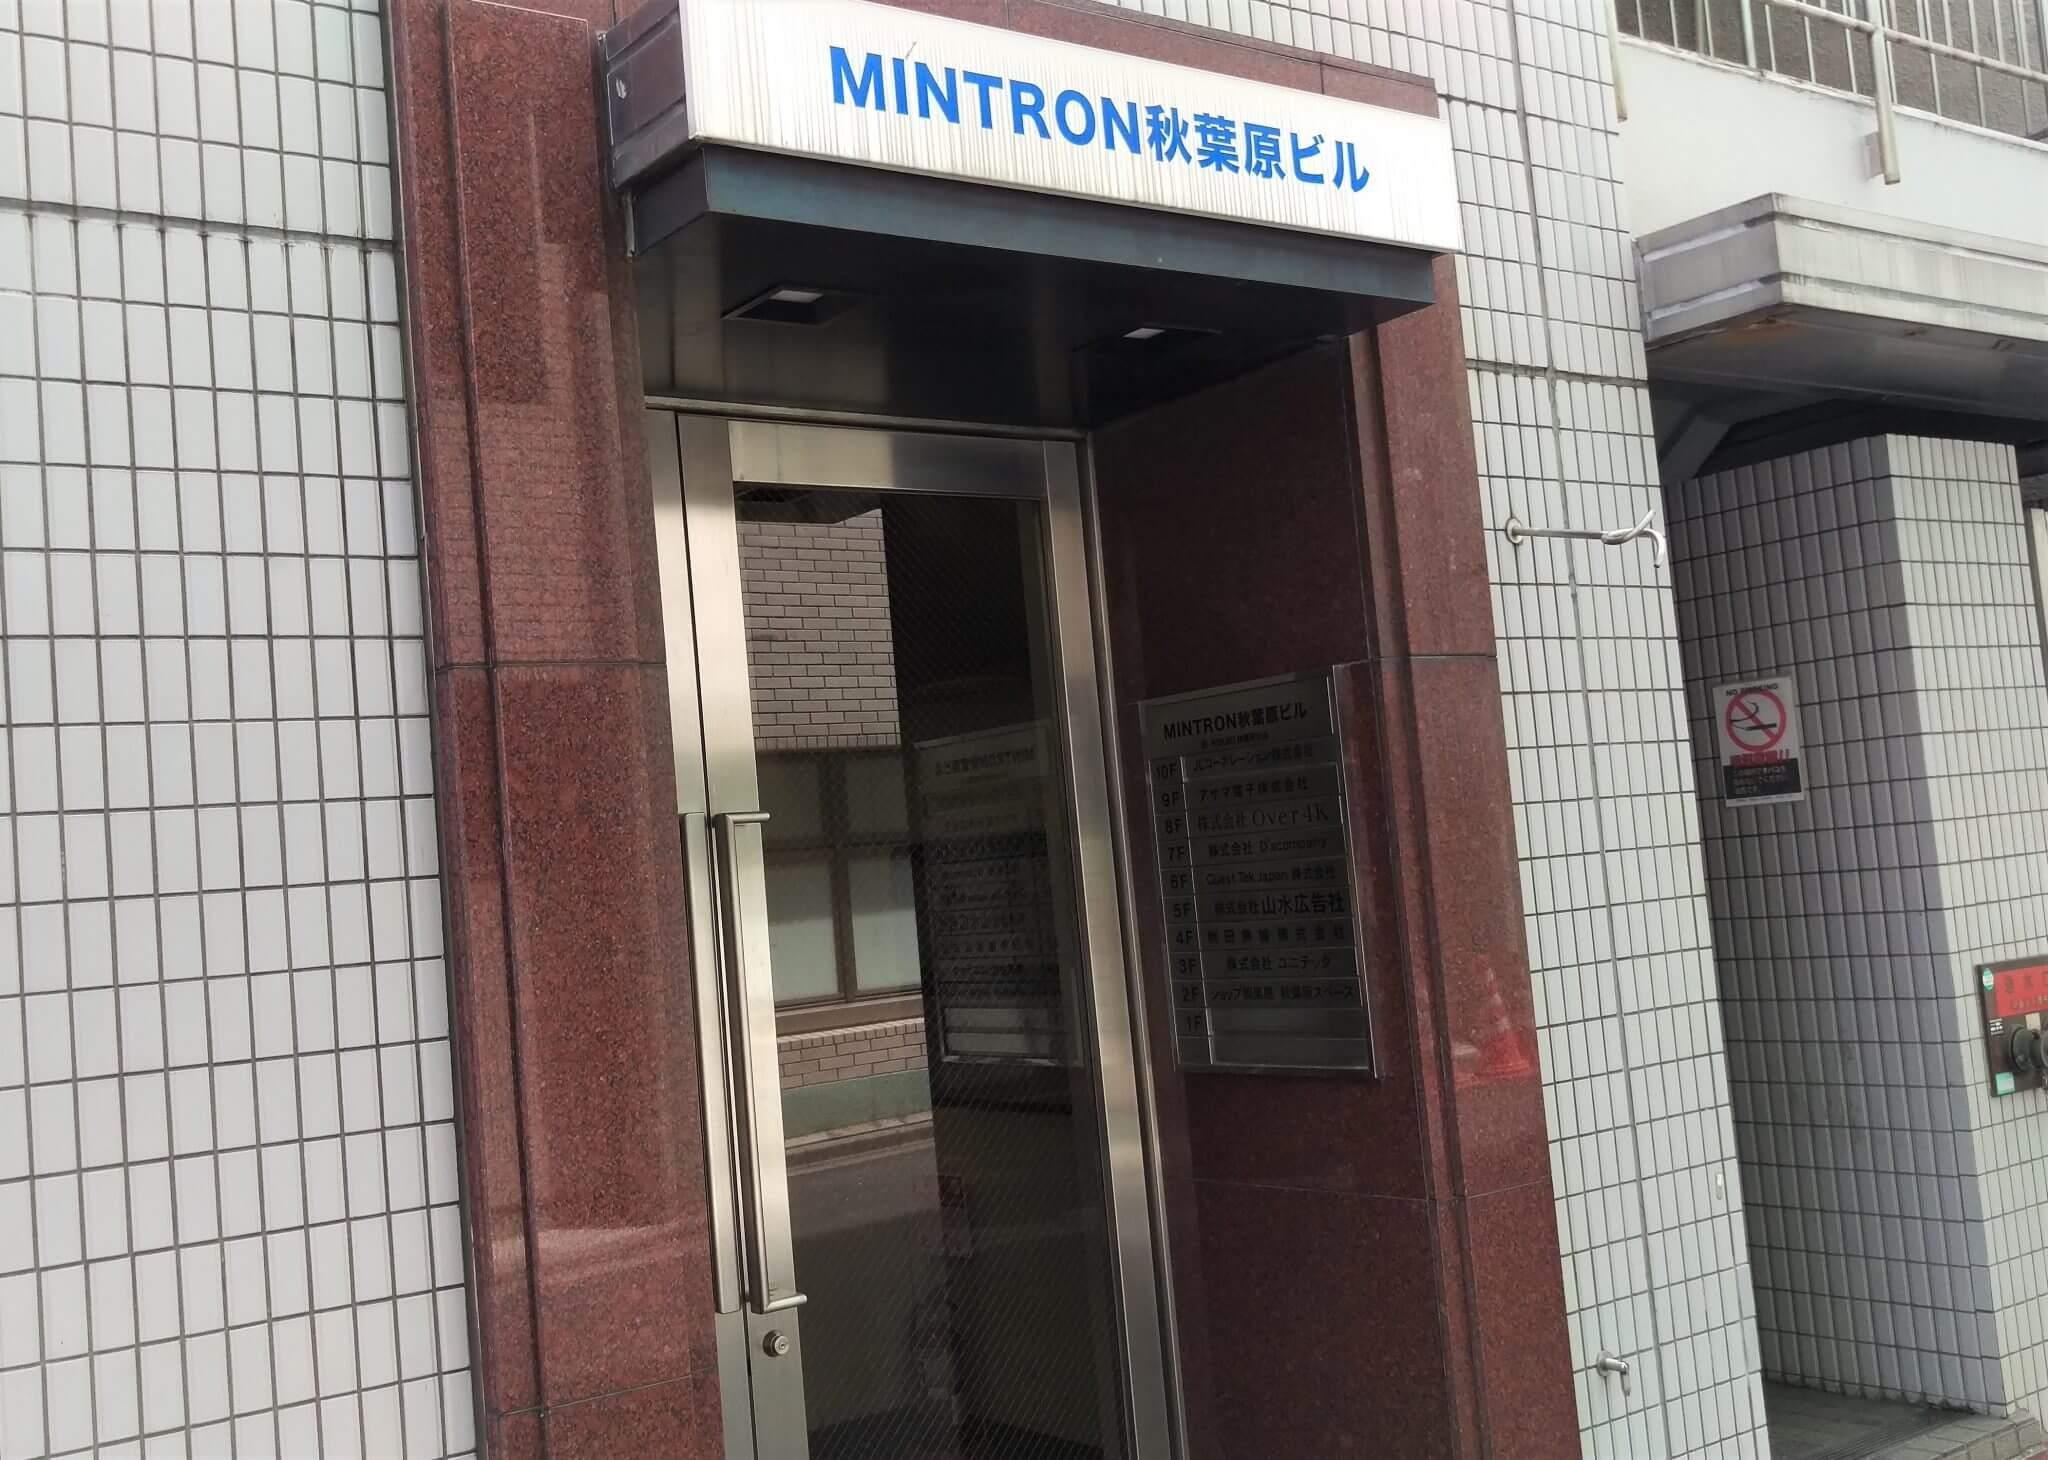 MINTRON1